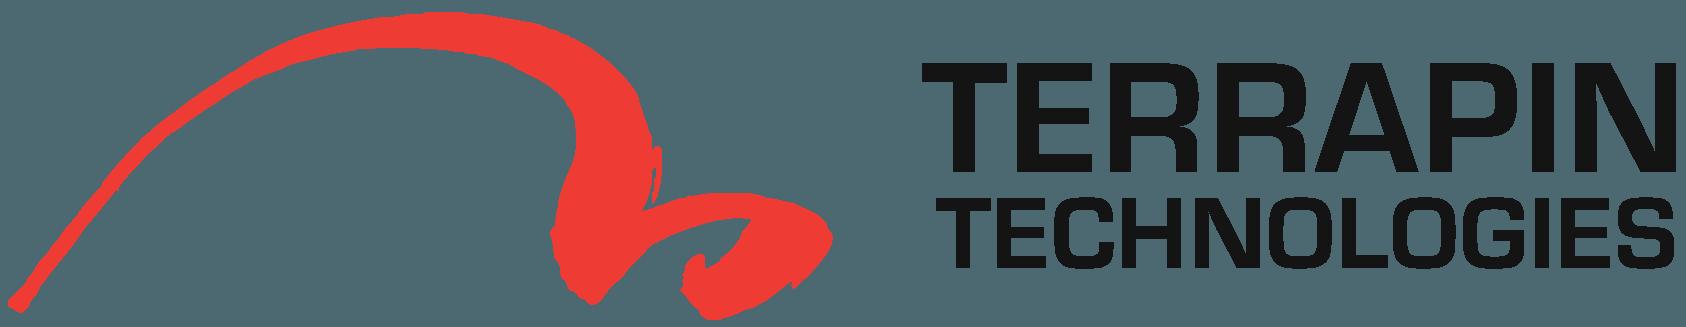 Terrapin Technologies